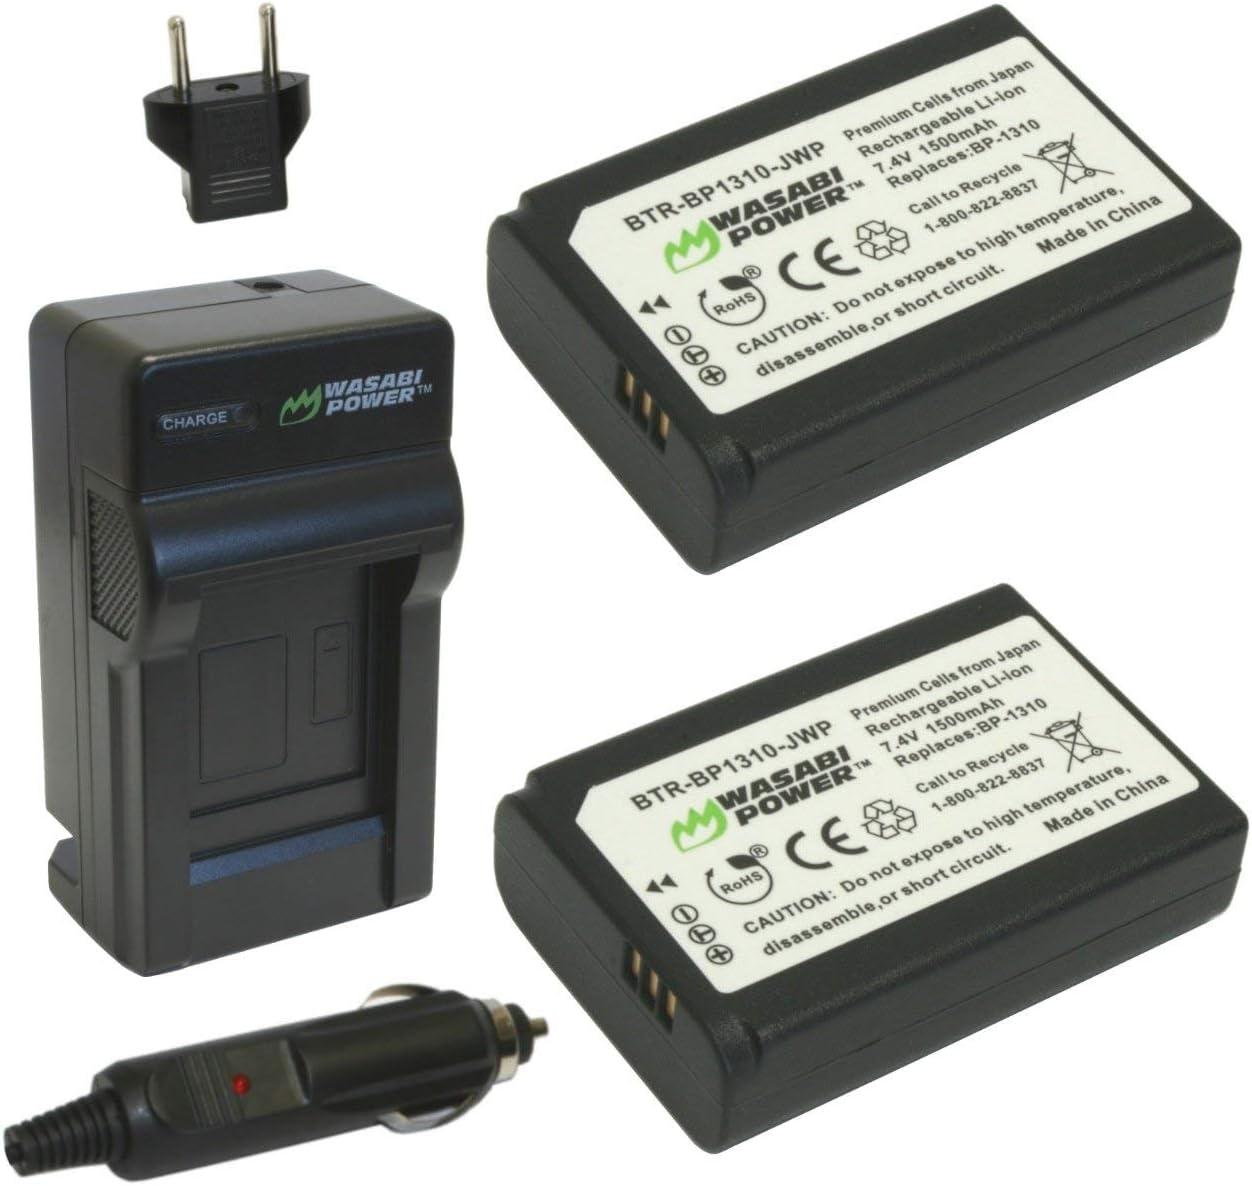 NX300M NX300 KAMERA AKKU LADEGERÄT MICRO USB für SAMSUNG